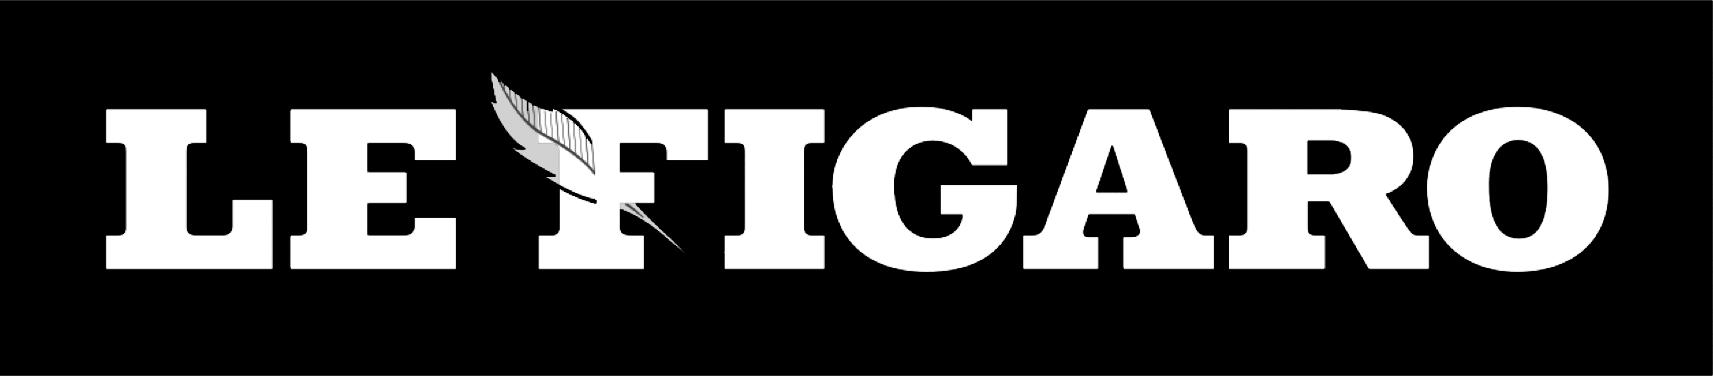 https://revlys.fr/wp-content/uploads/sites/2/2021/04/Logo-Figaro-bw.png